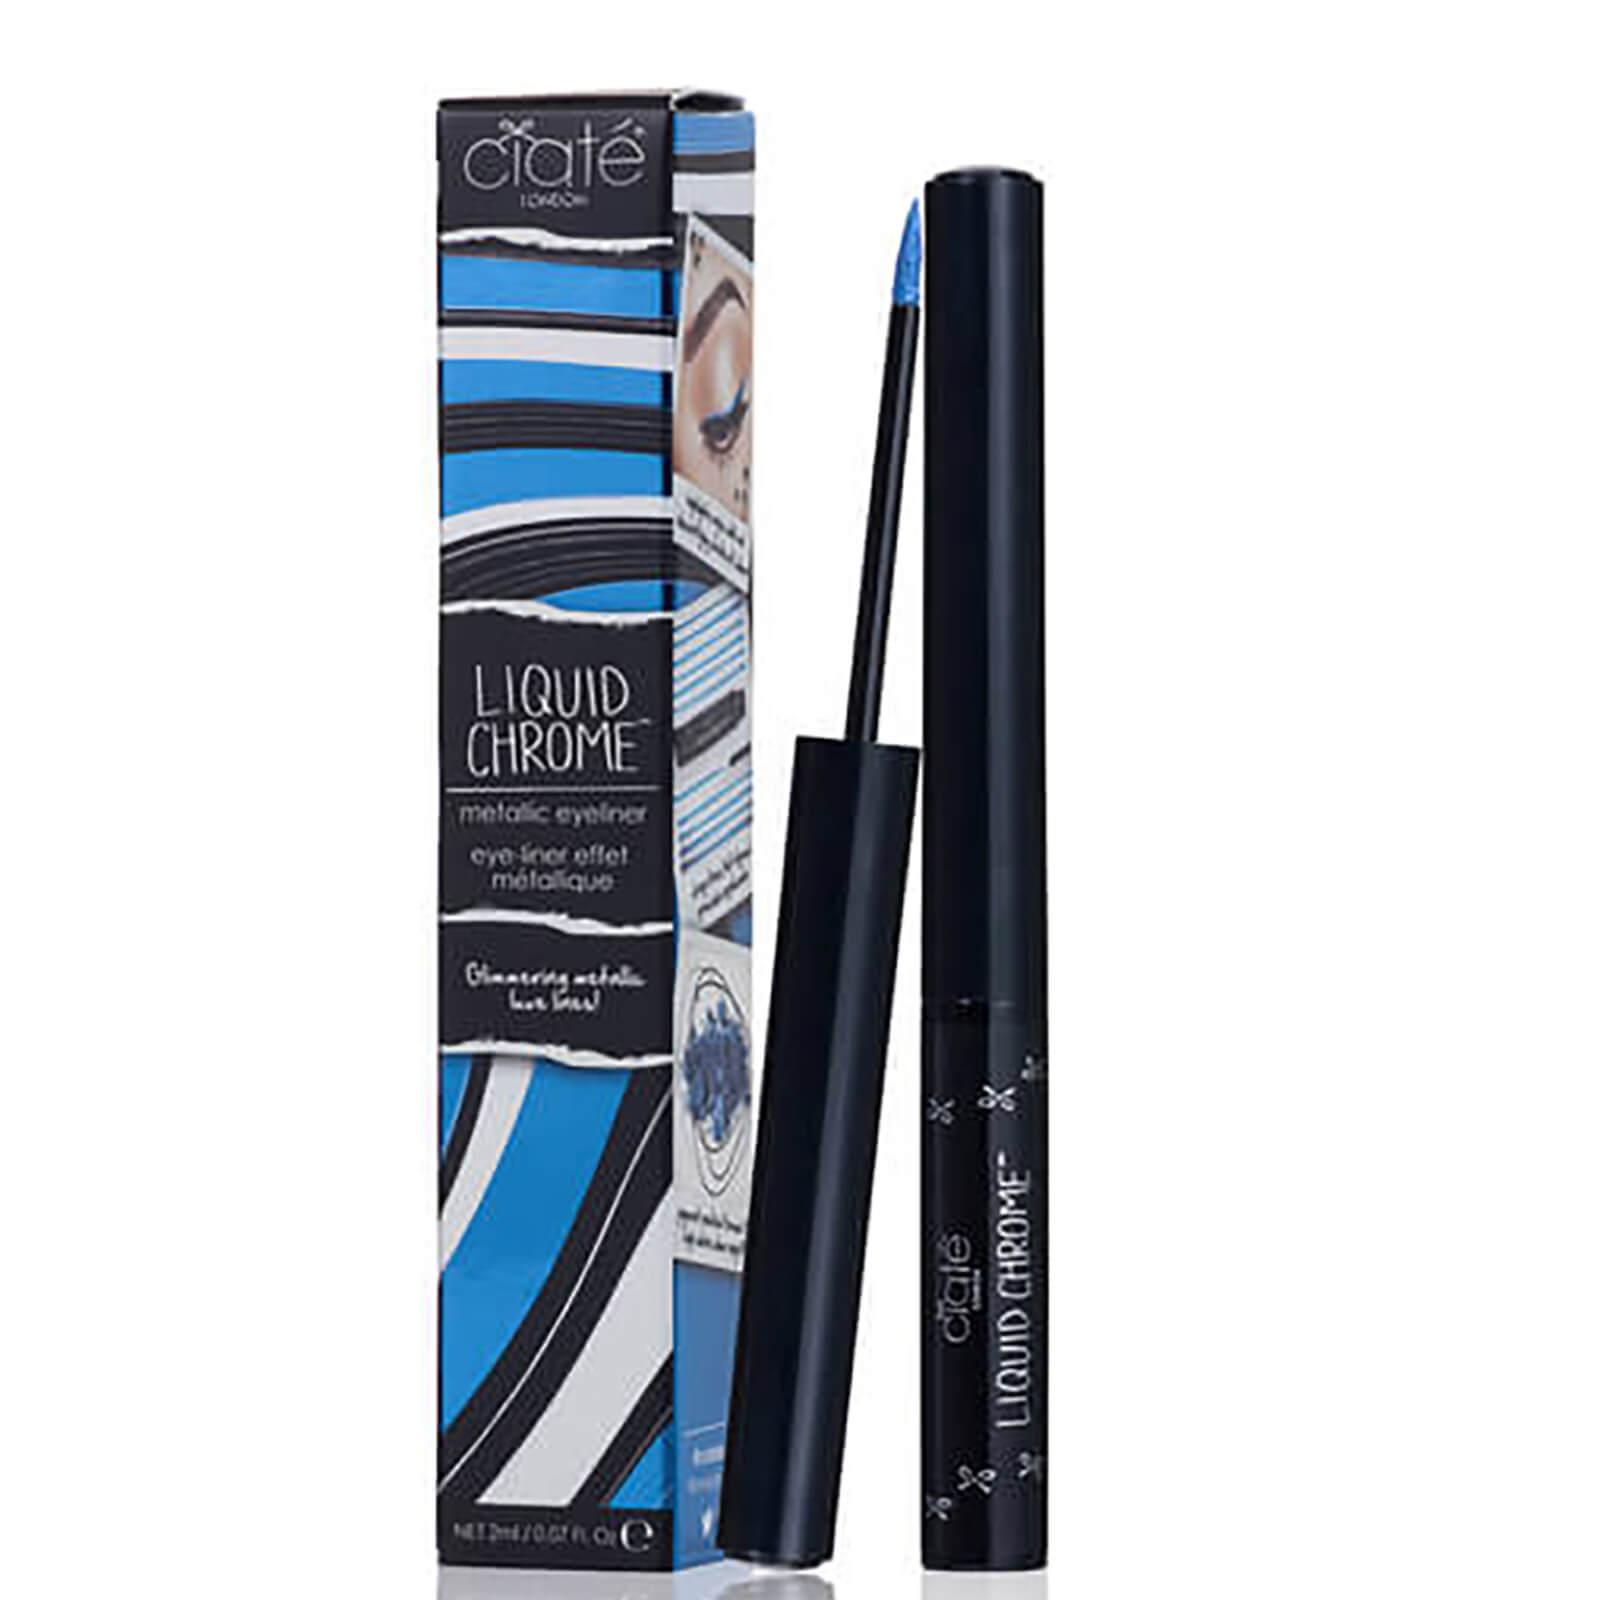 Ciat London Liquid Chrome Eye Liner Various Shades Beautyexpert Sleep Buddy Set Bed Cover Square Cotton Sateen Extra